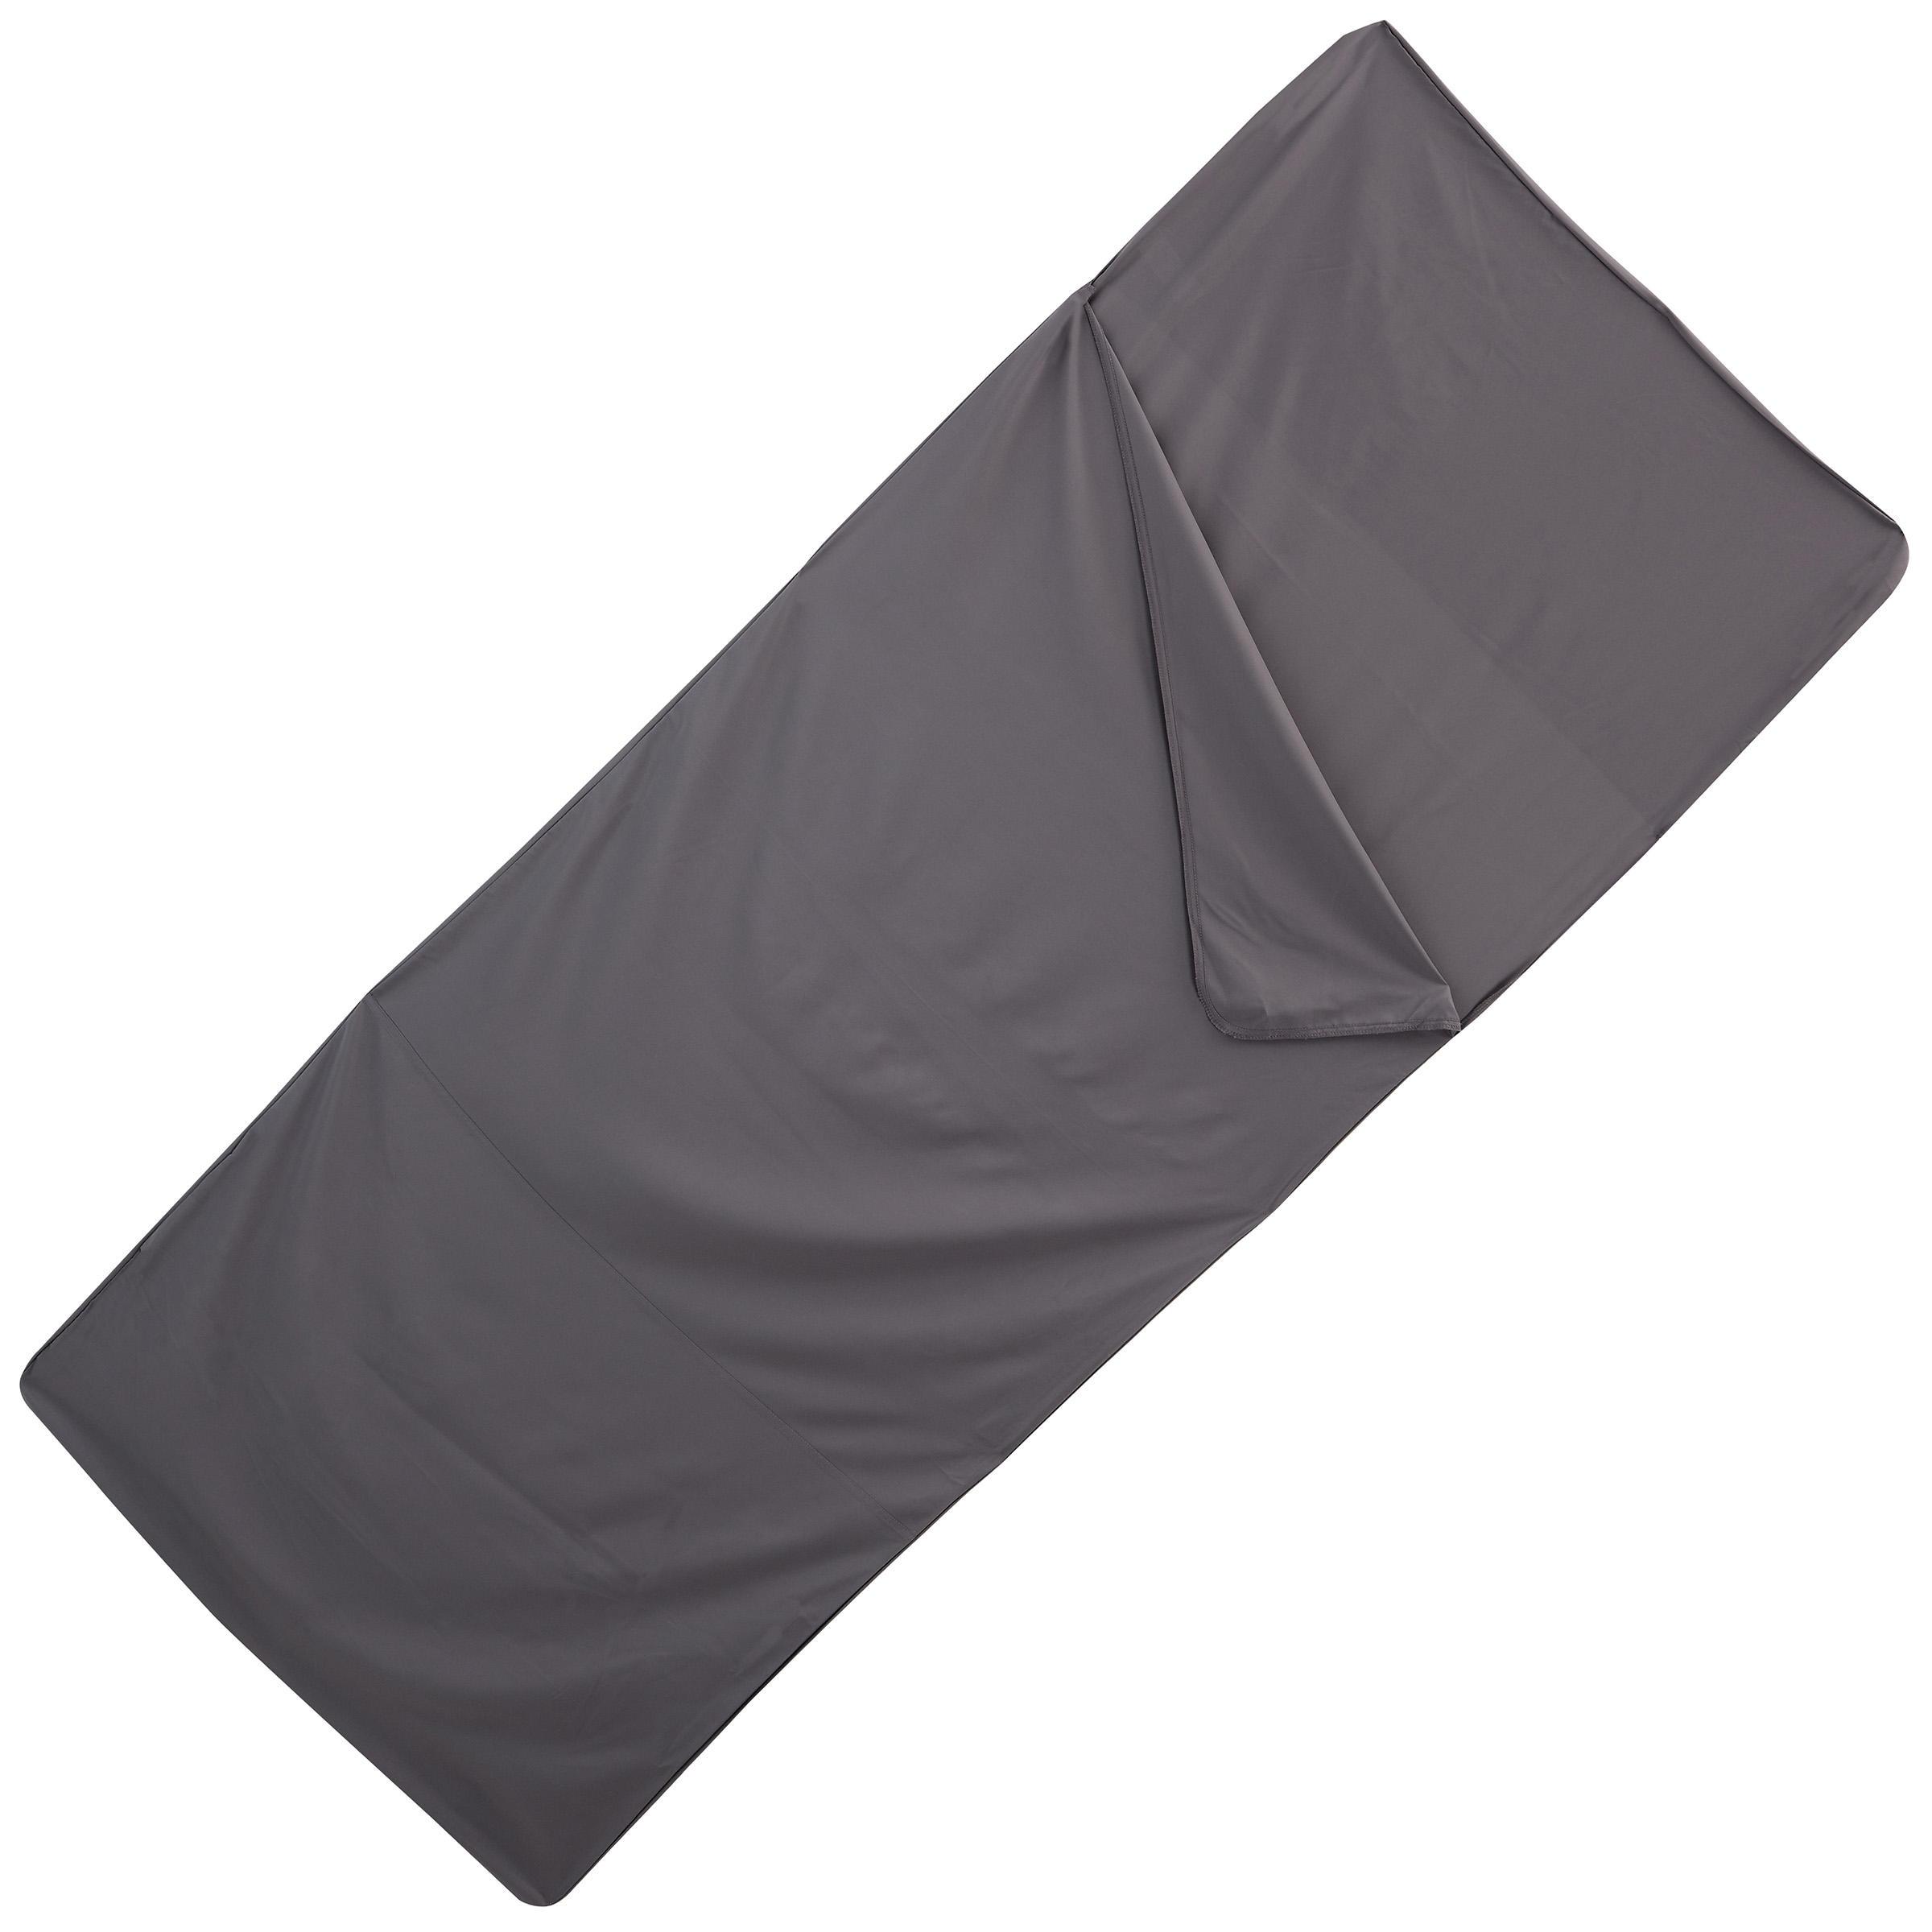 Polyester Sleeping Bag Liner - Grey